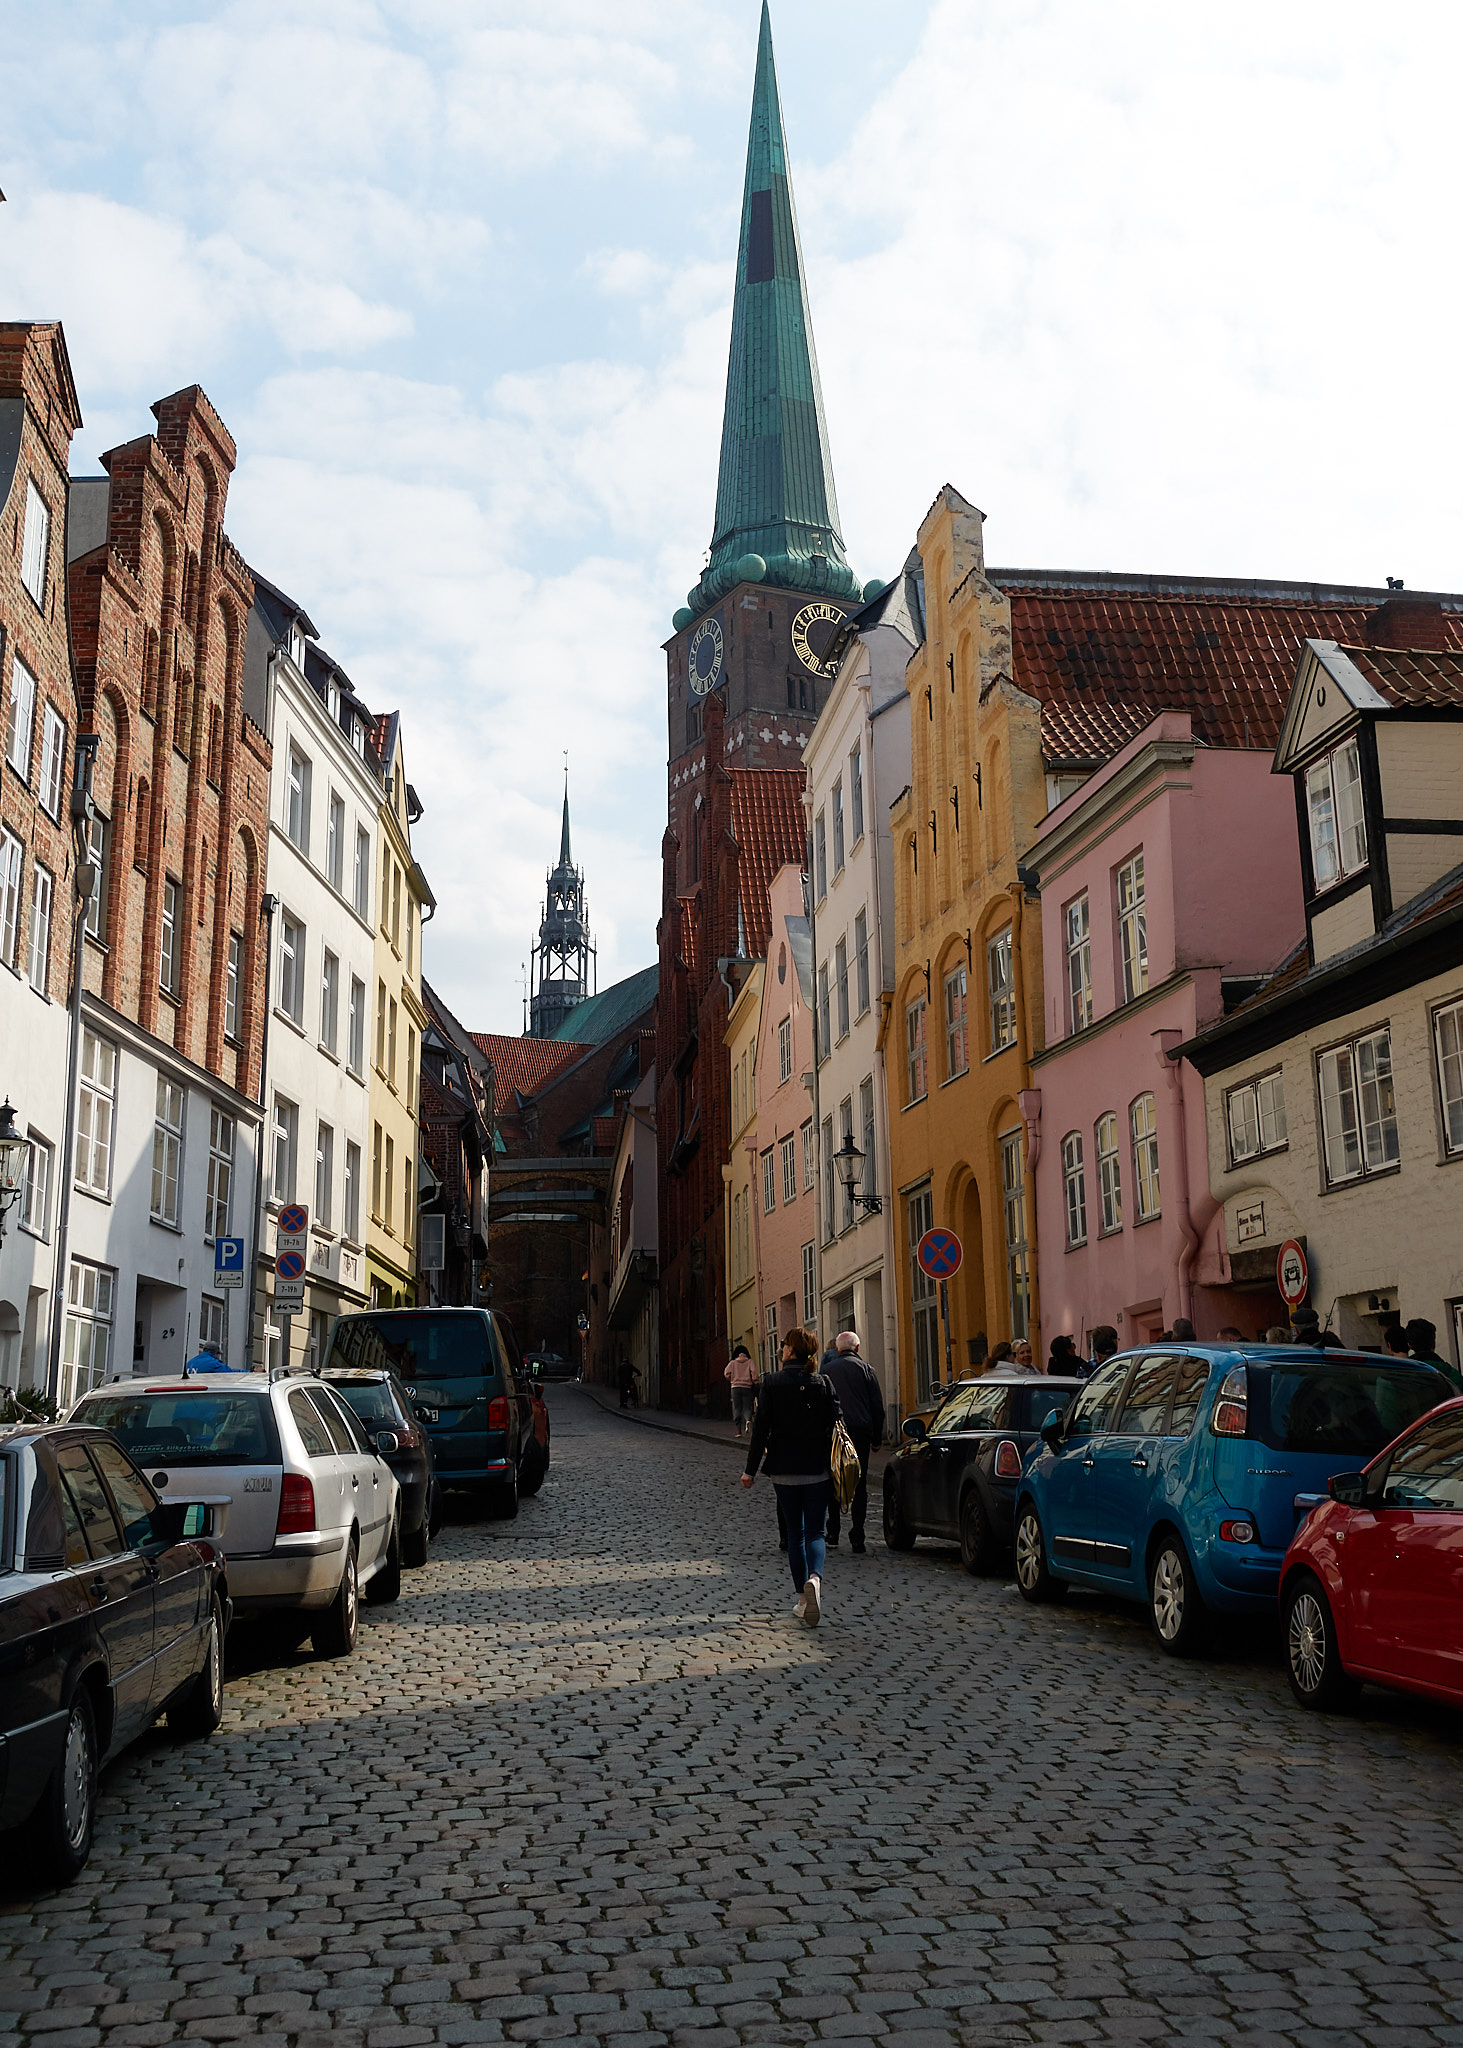 20190330-Lübeck-314.jpg